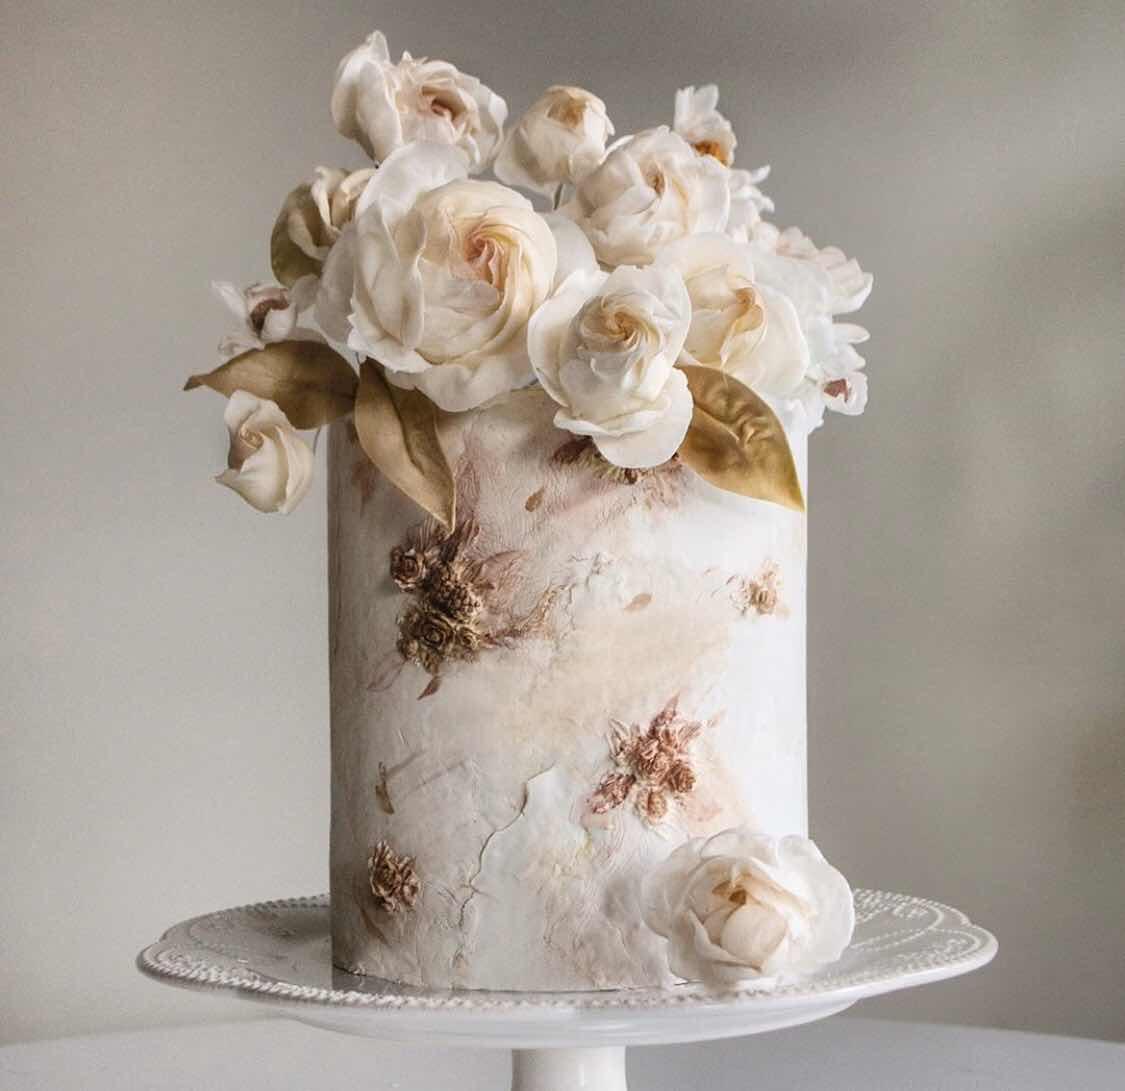 Magical Cake Designs by Cynthia Irani Design – oxak news